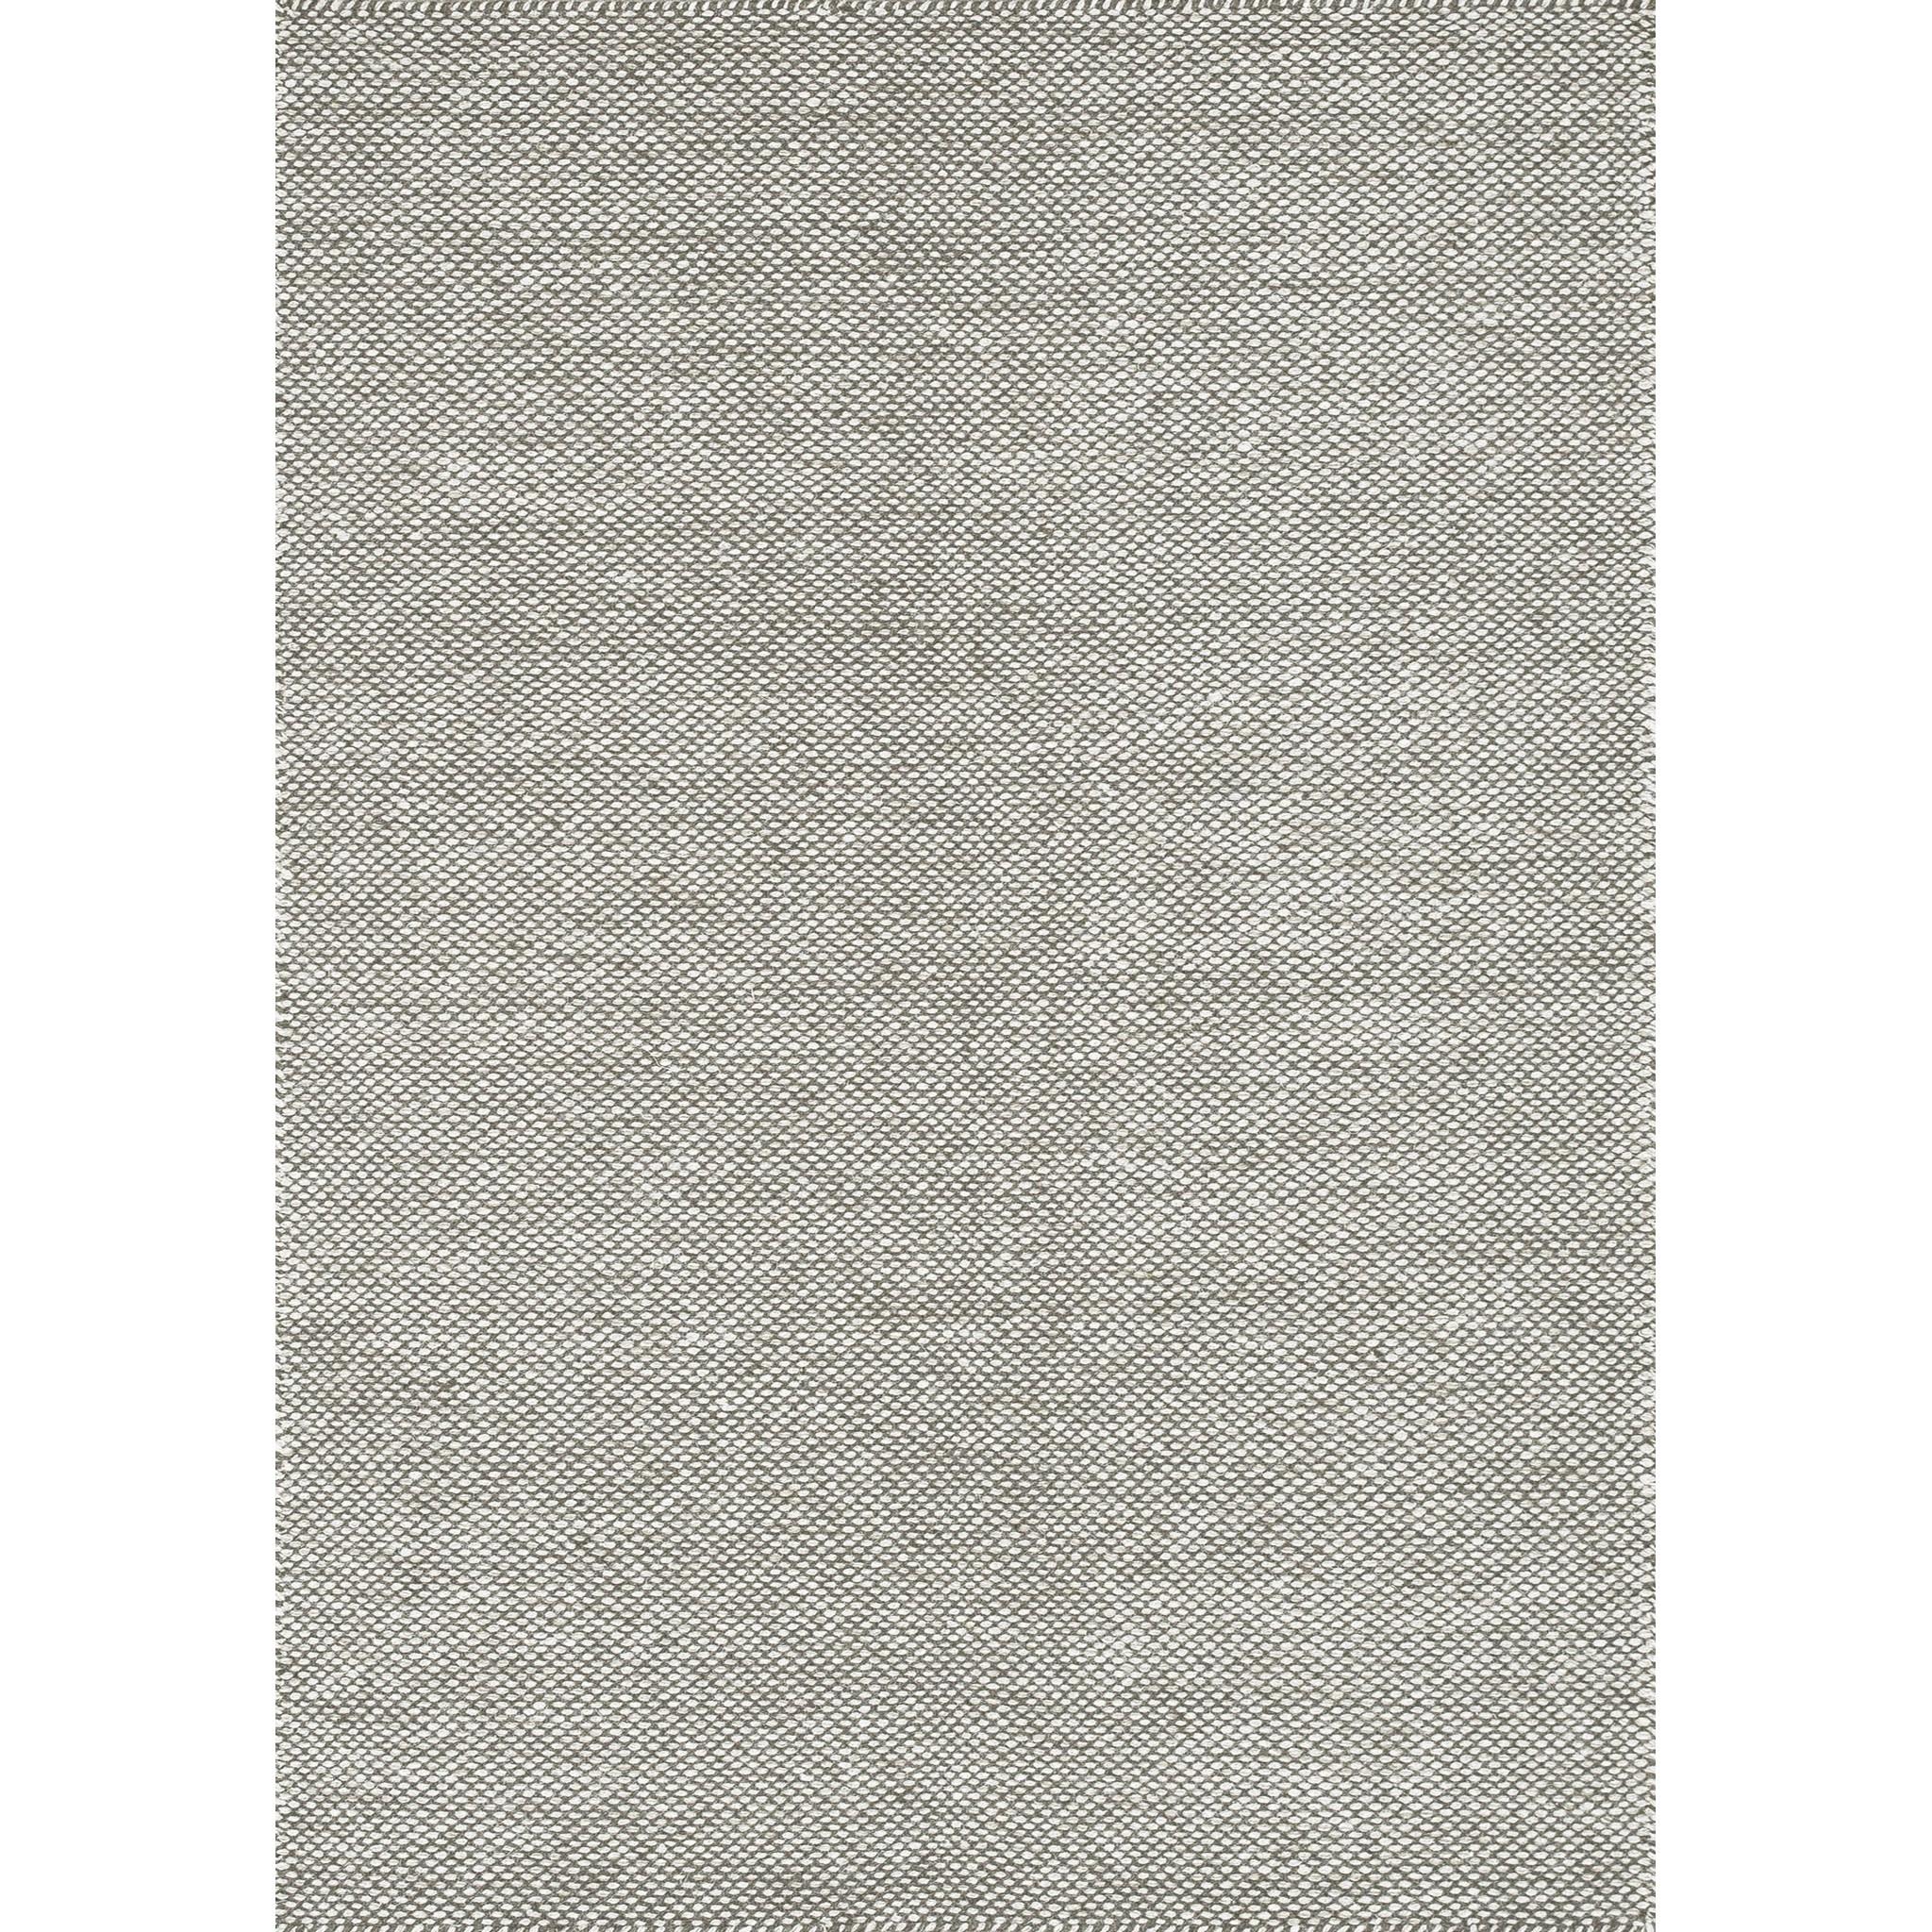 "Oakwood 7'-10"" x 11'-0"" Area Rug by Loloi Rugs at Belfort Furniture"